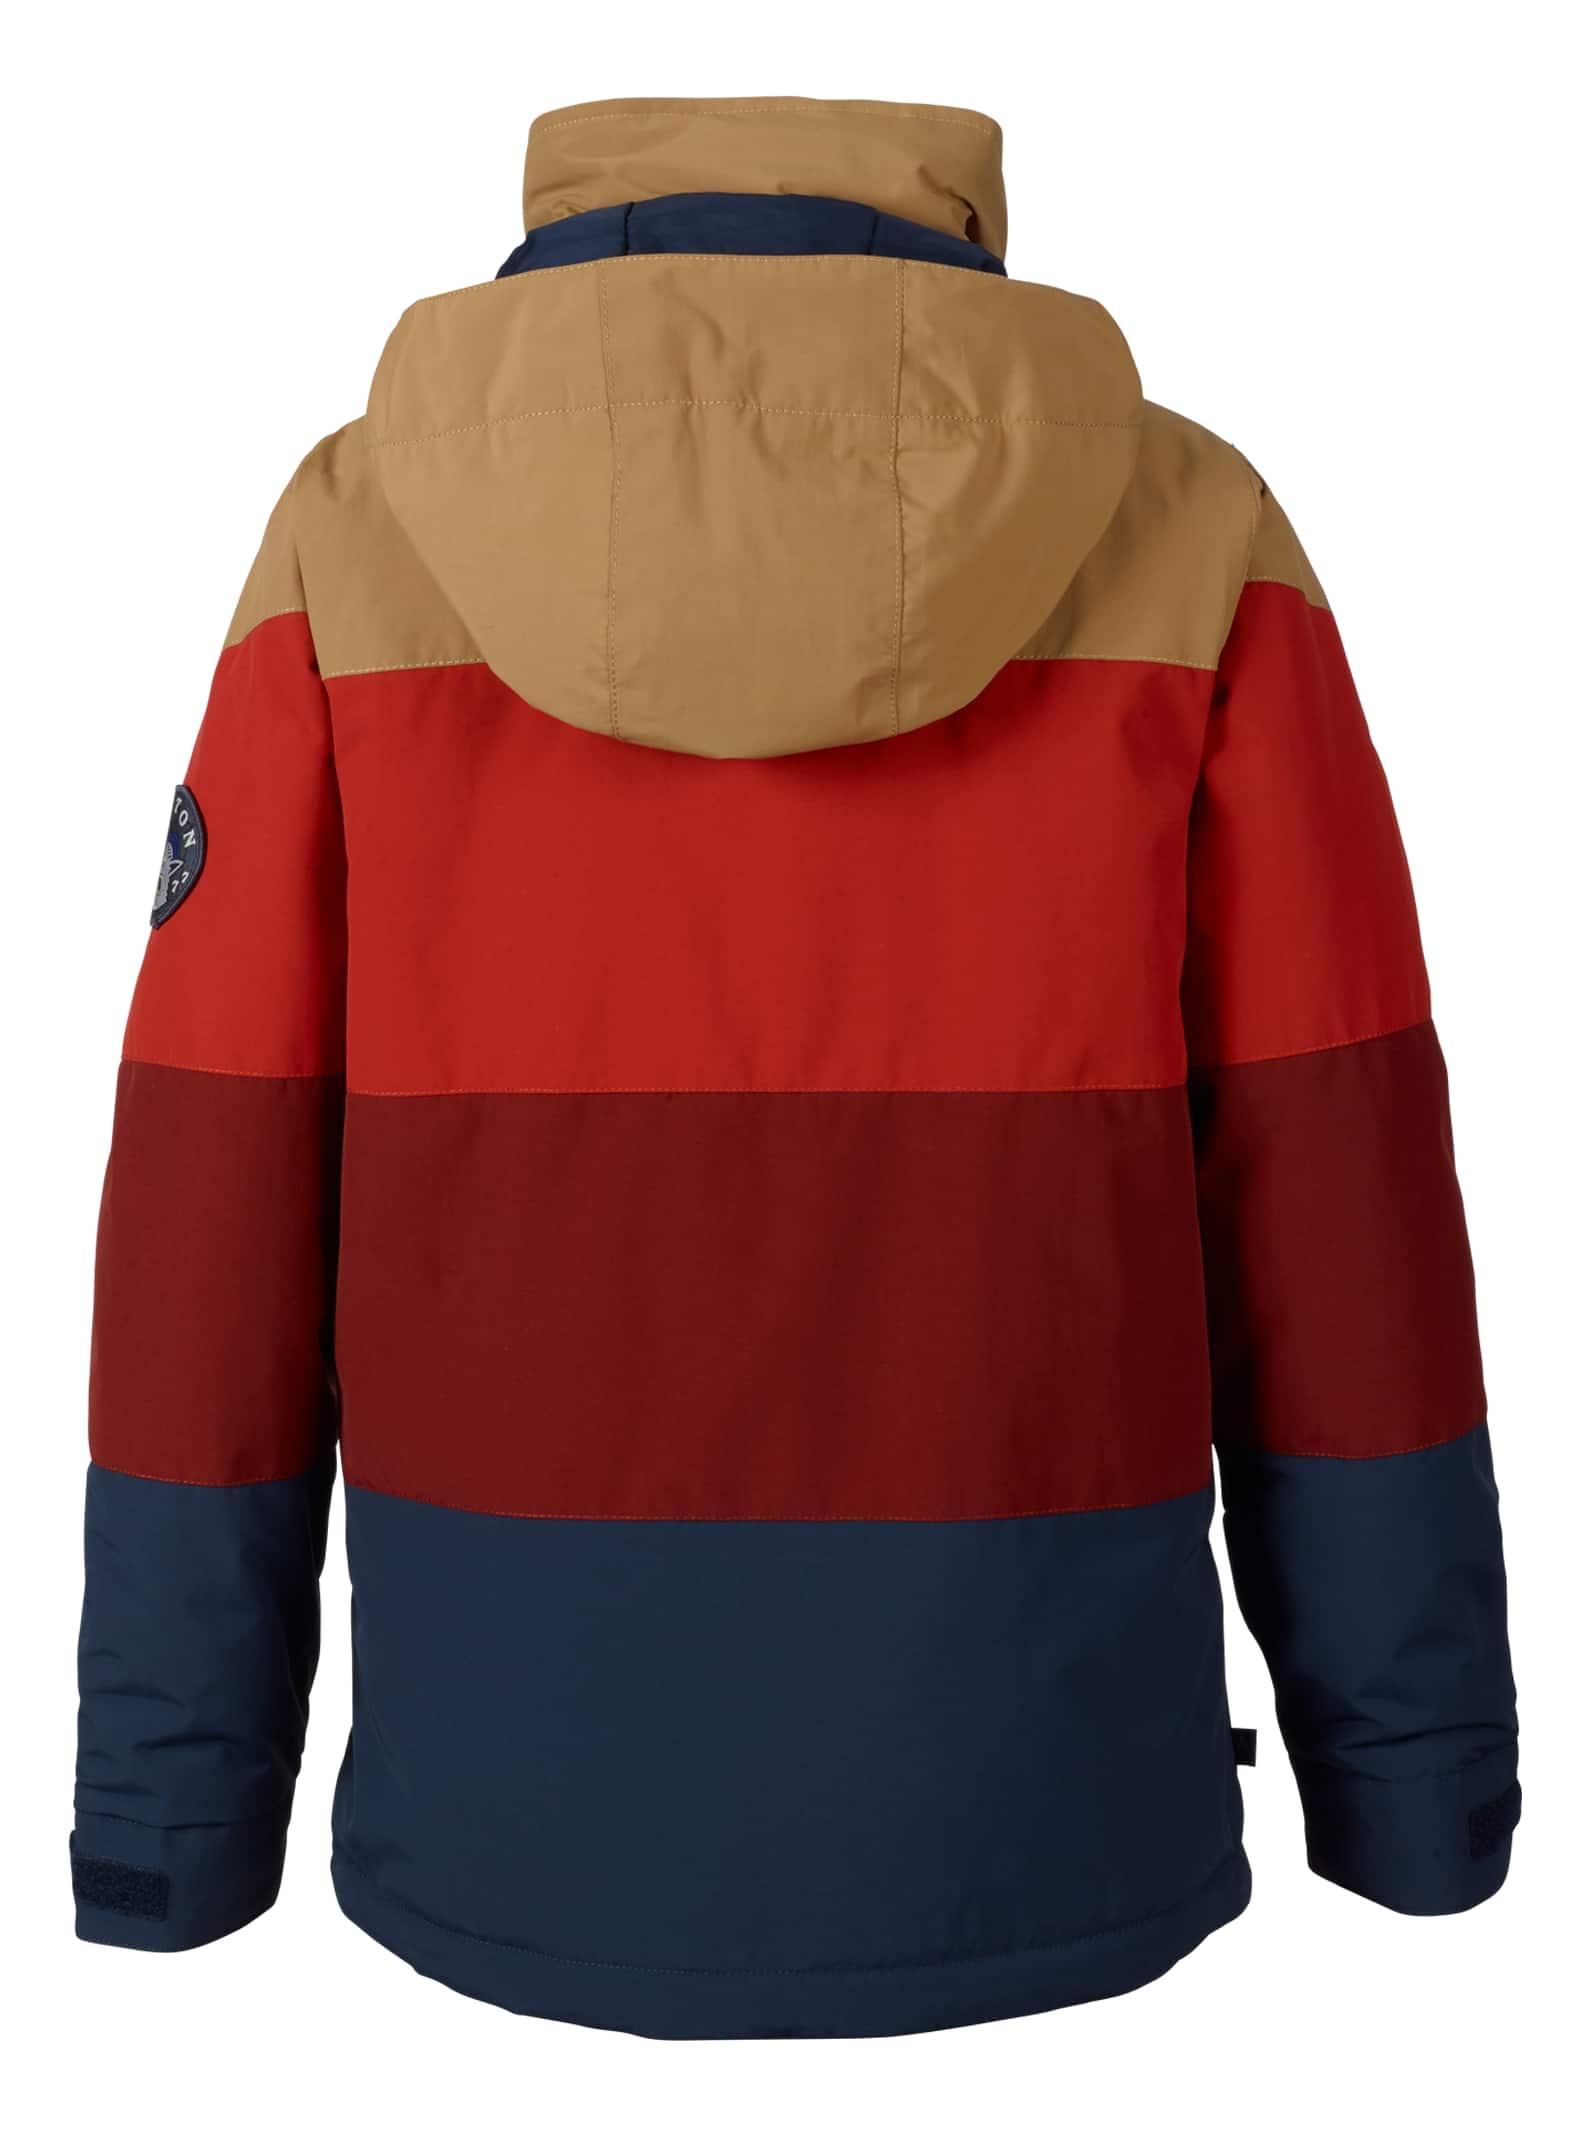 ac4cbad7a3f3 Boys' Burton Symbol Jacket | Burton Snowboards Winter 2018